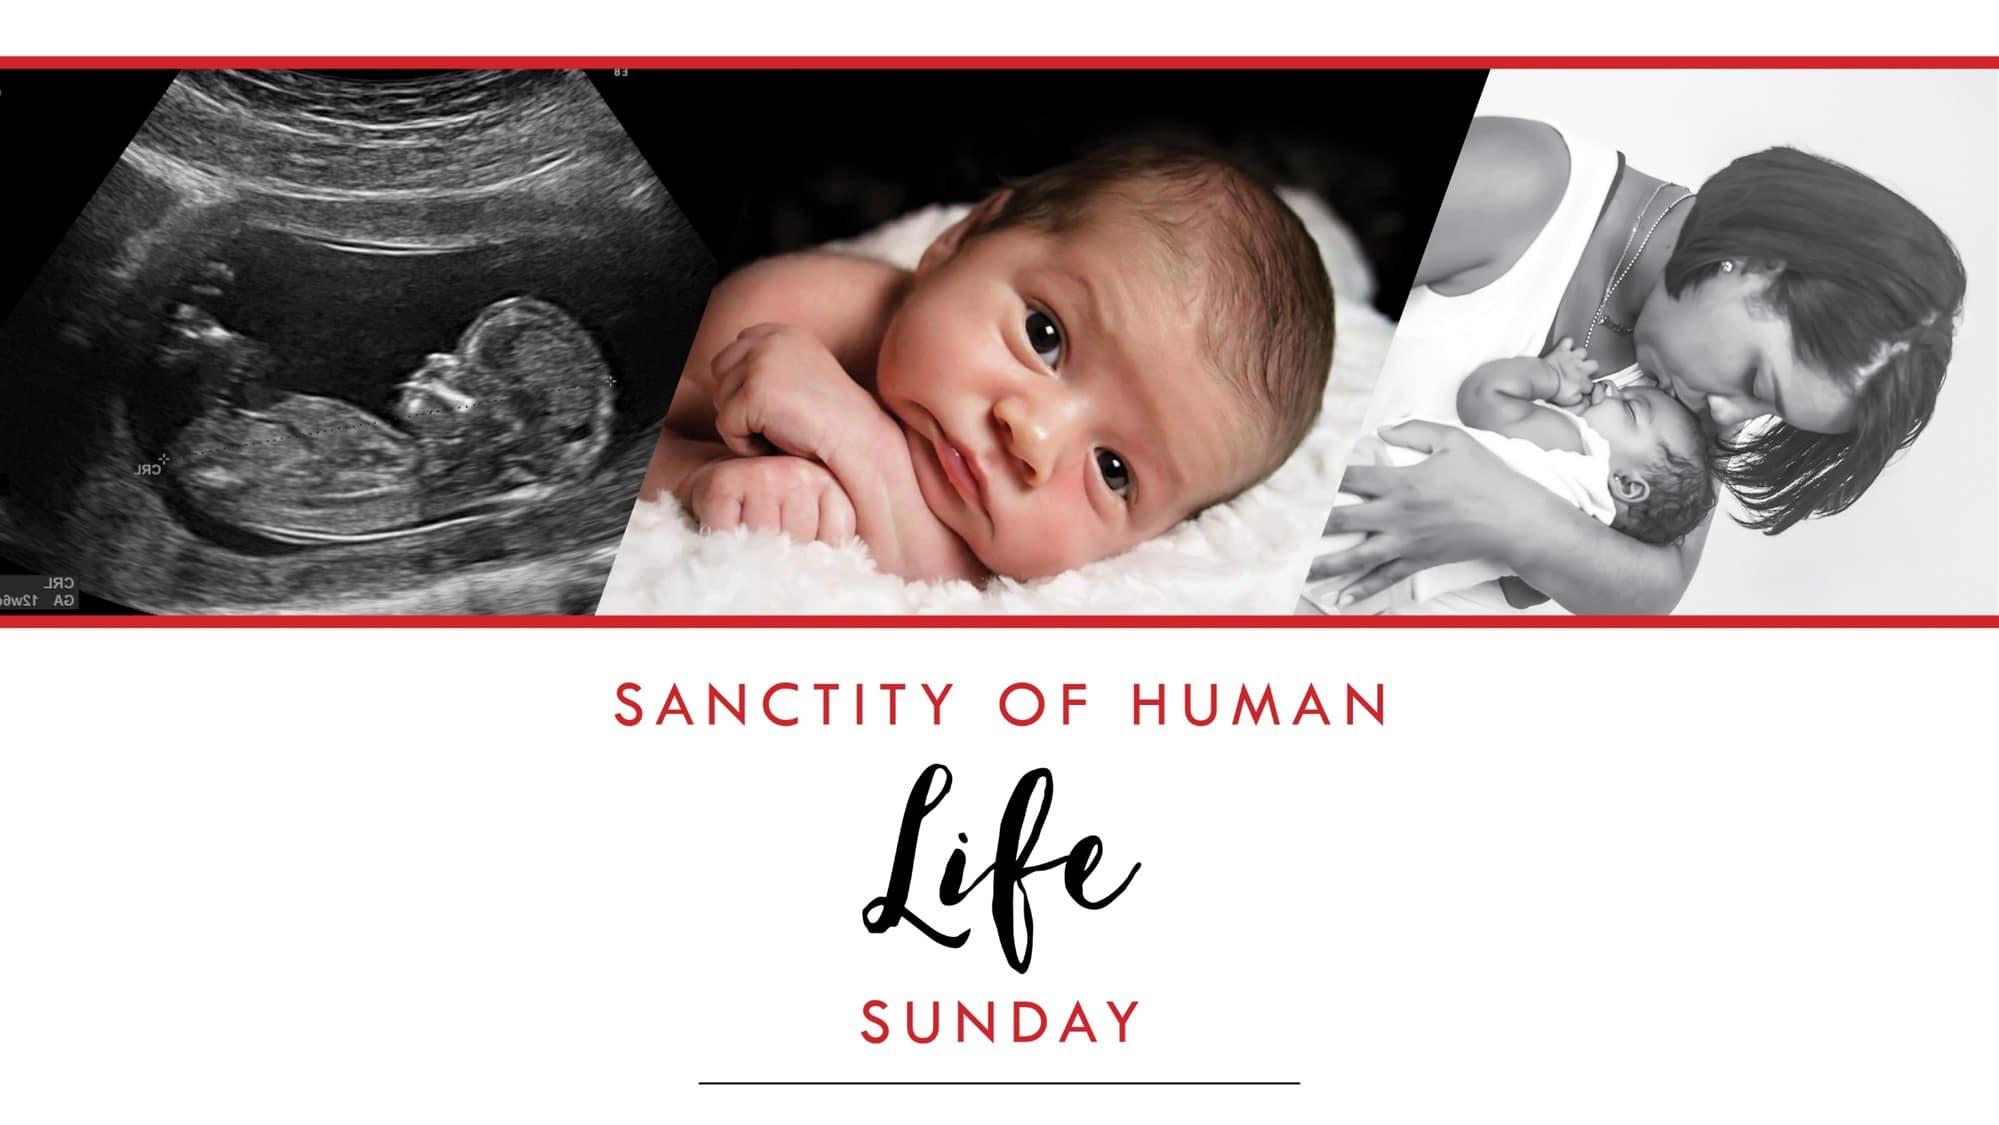 Sanctity of Himan Life Sunday